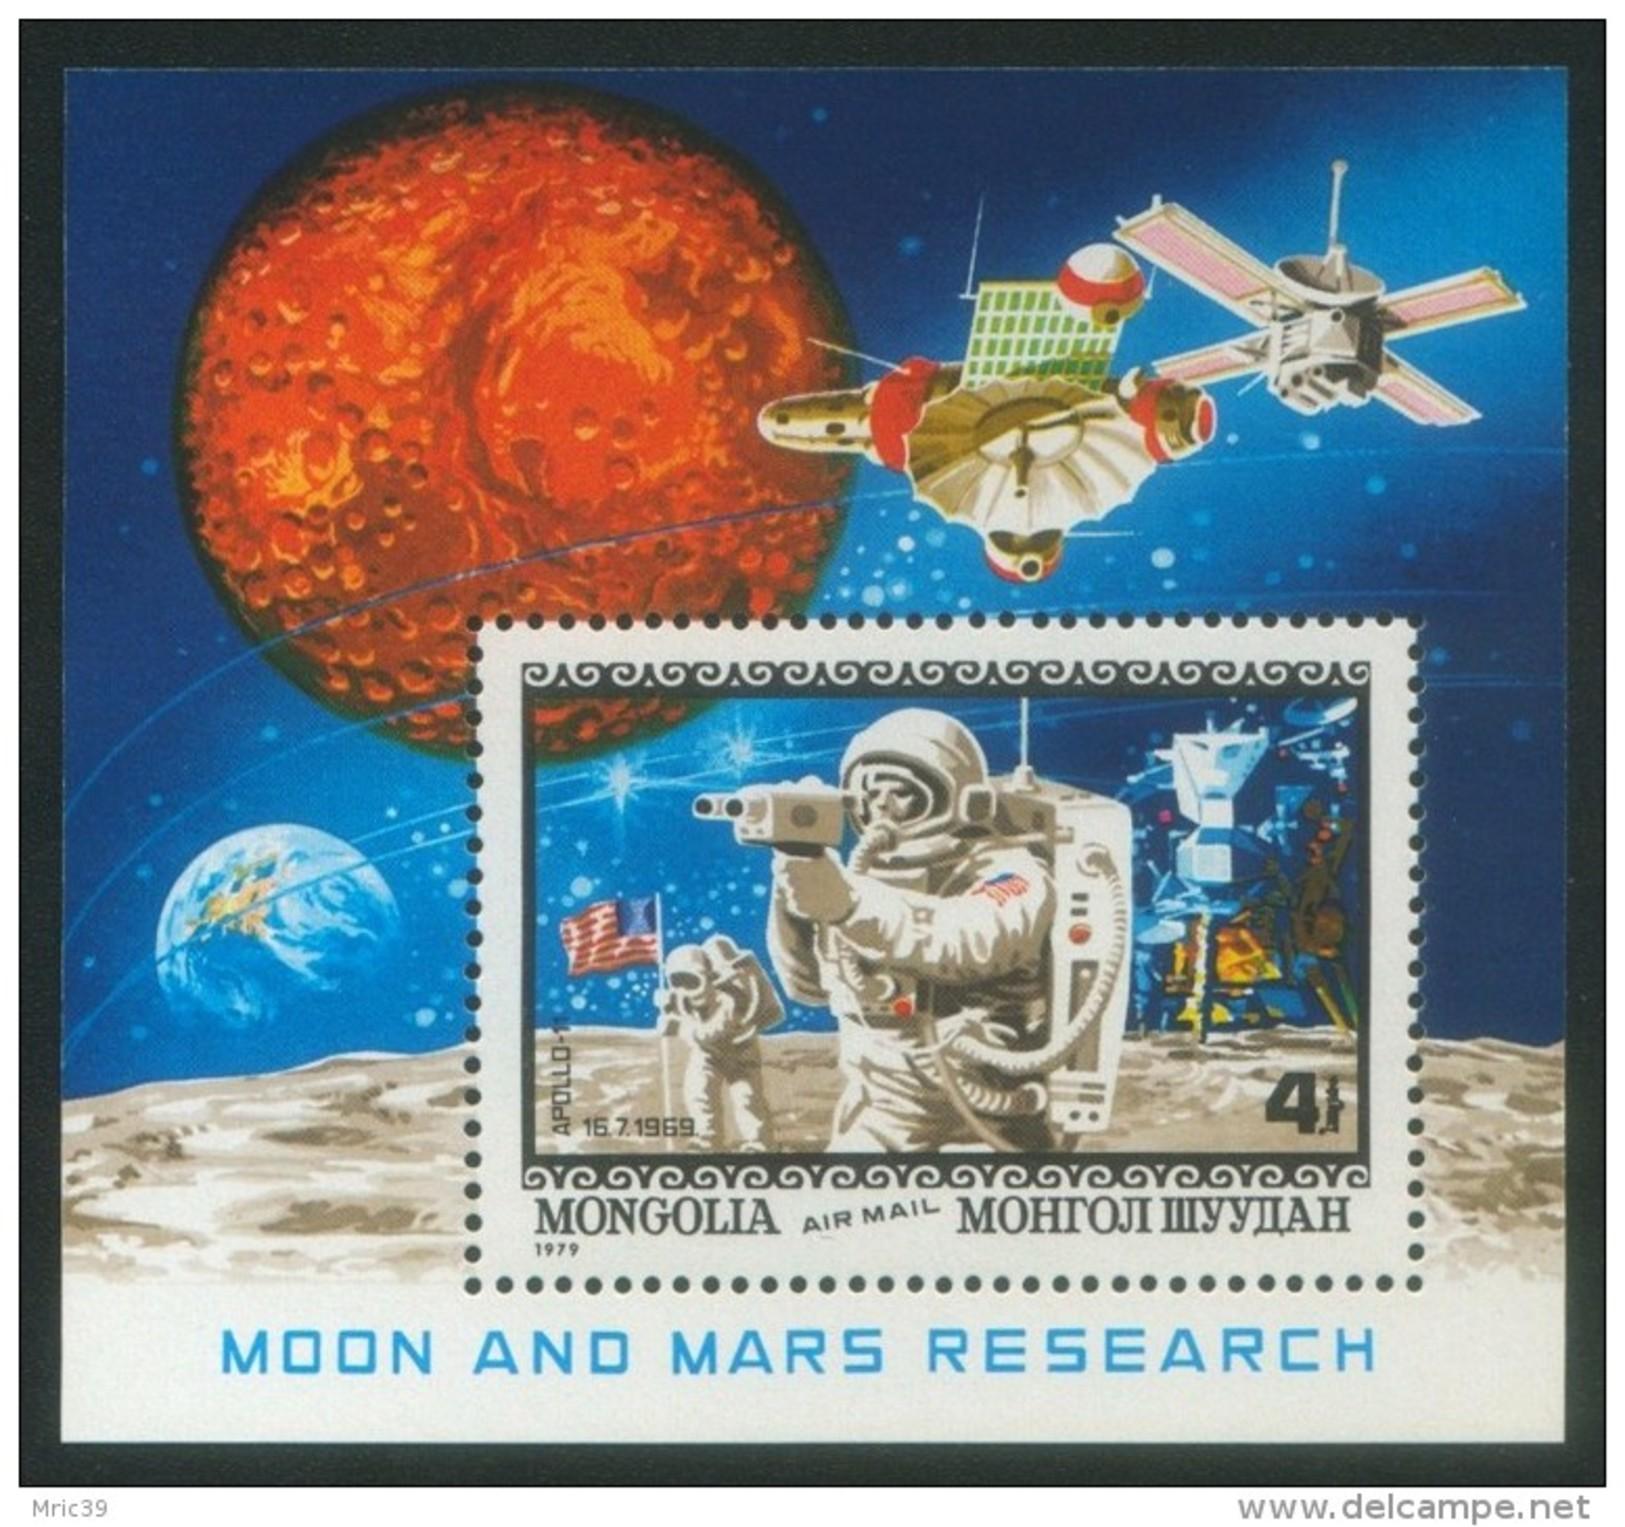 Bloc Sheet Espace Space  Neuf ** MNH   Mongolie Mongolia  1979 - Unclassified